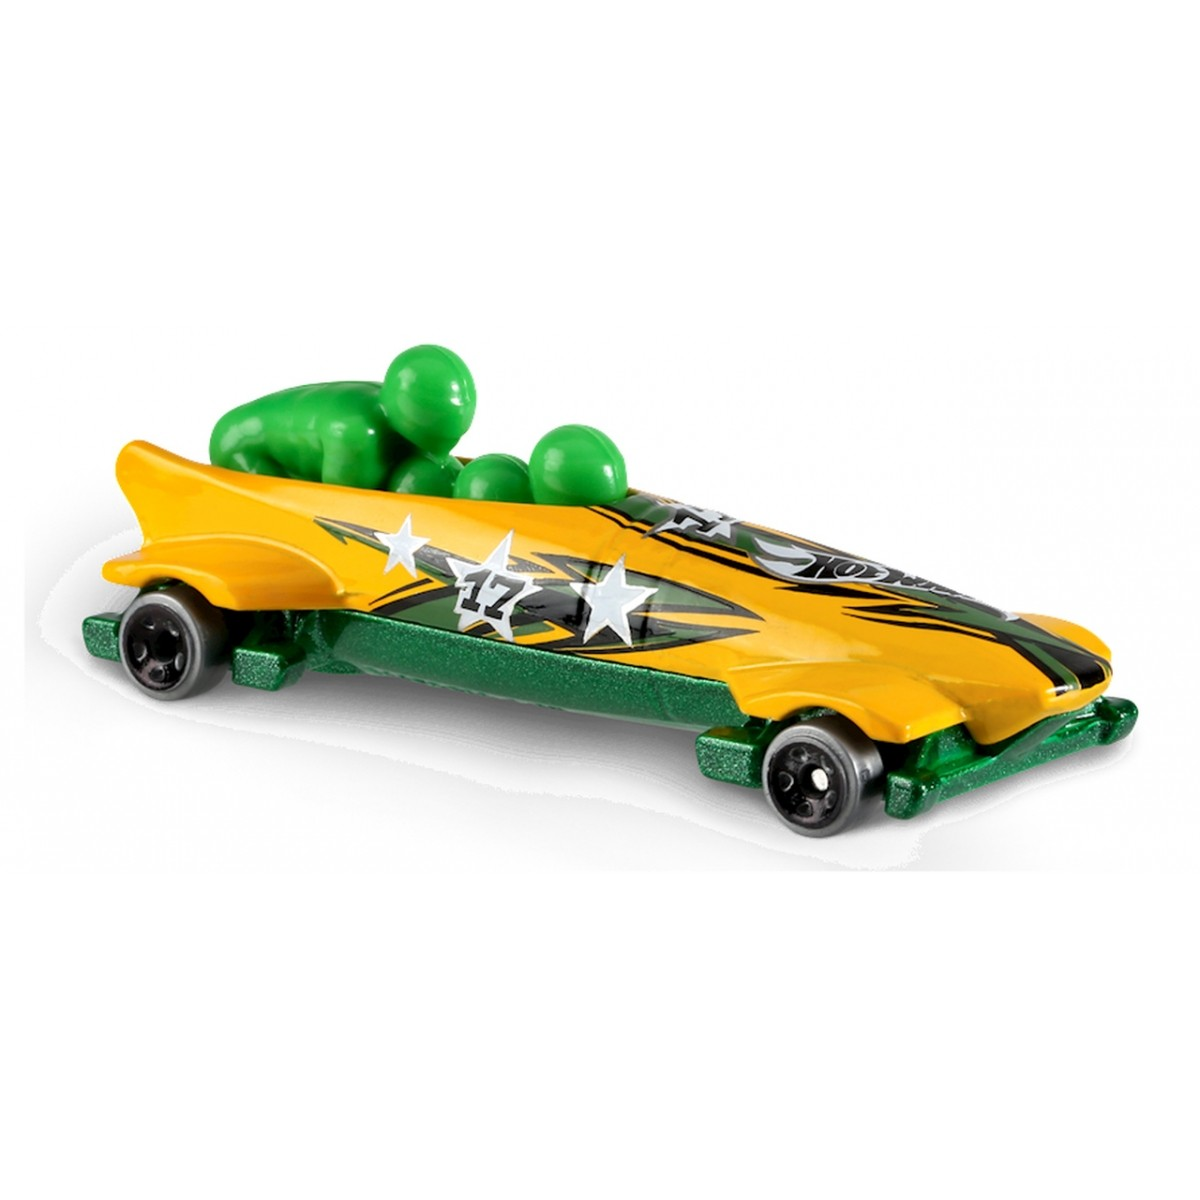 Carrinho Hot Wheels: Ice Shredder Amarelo